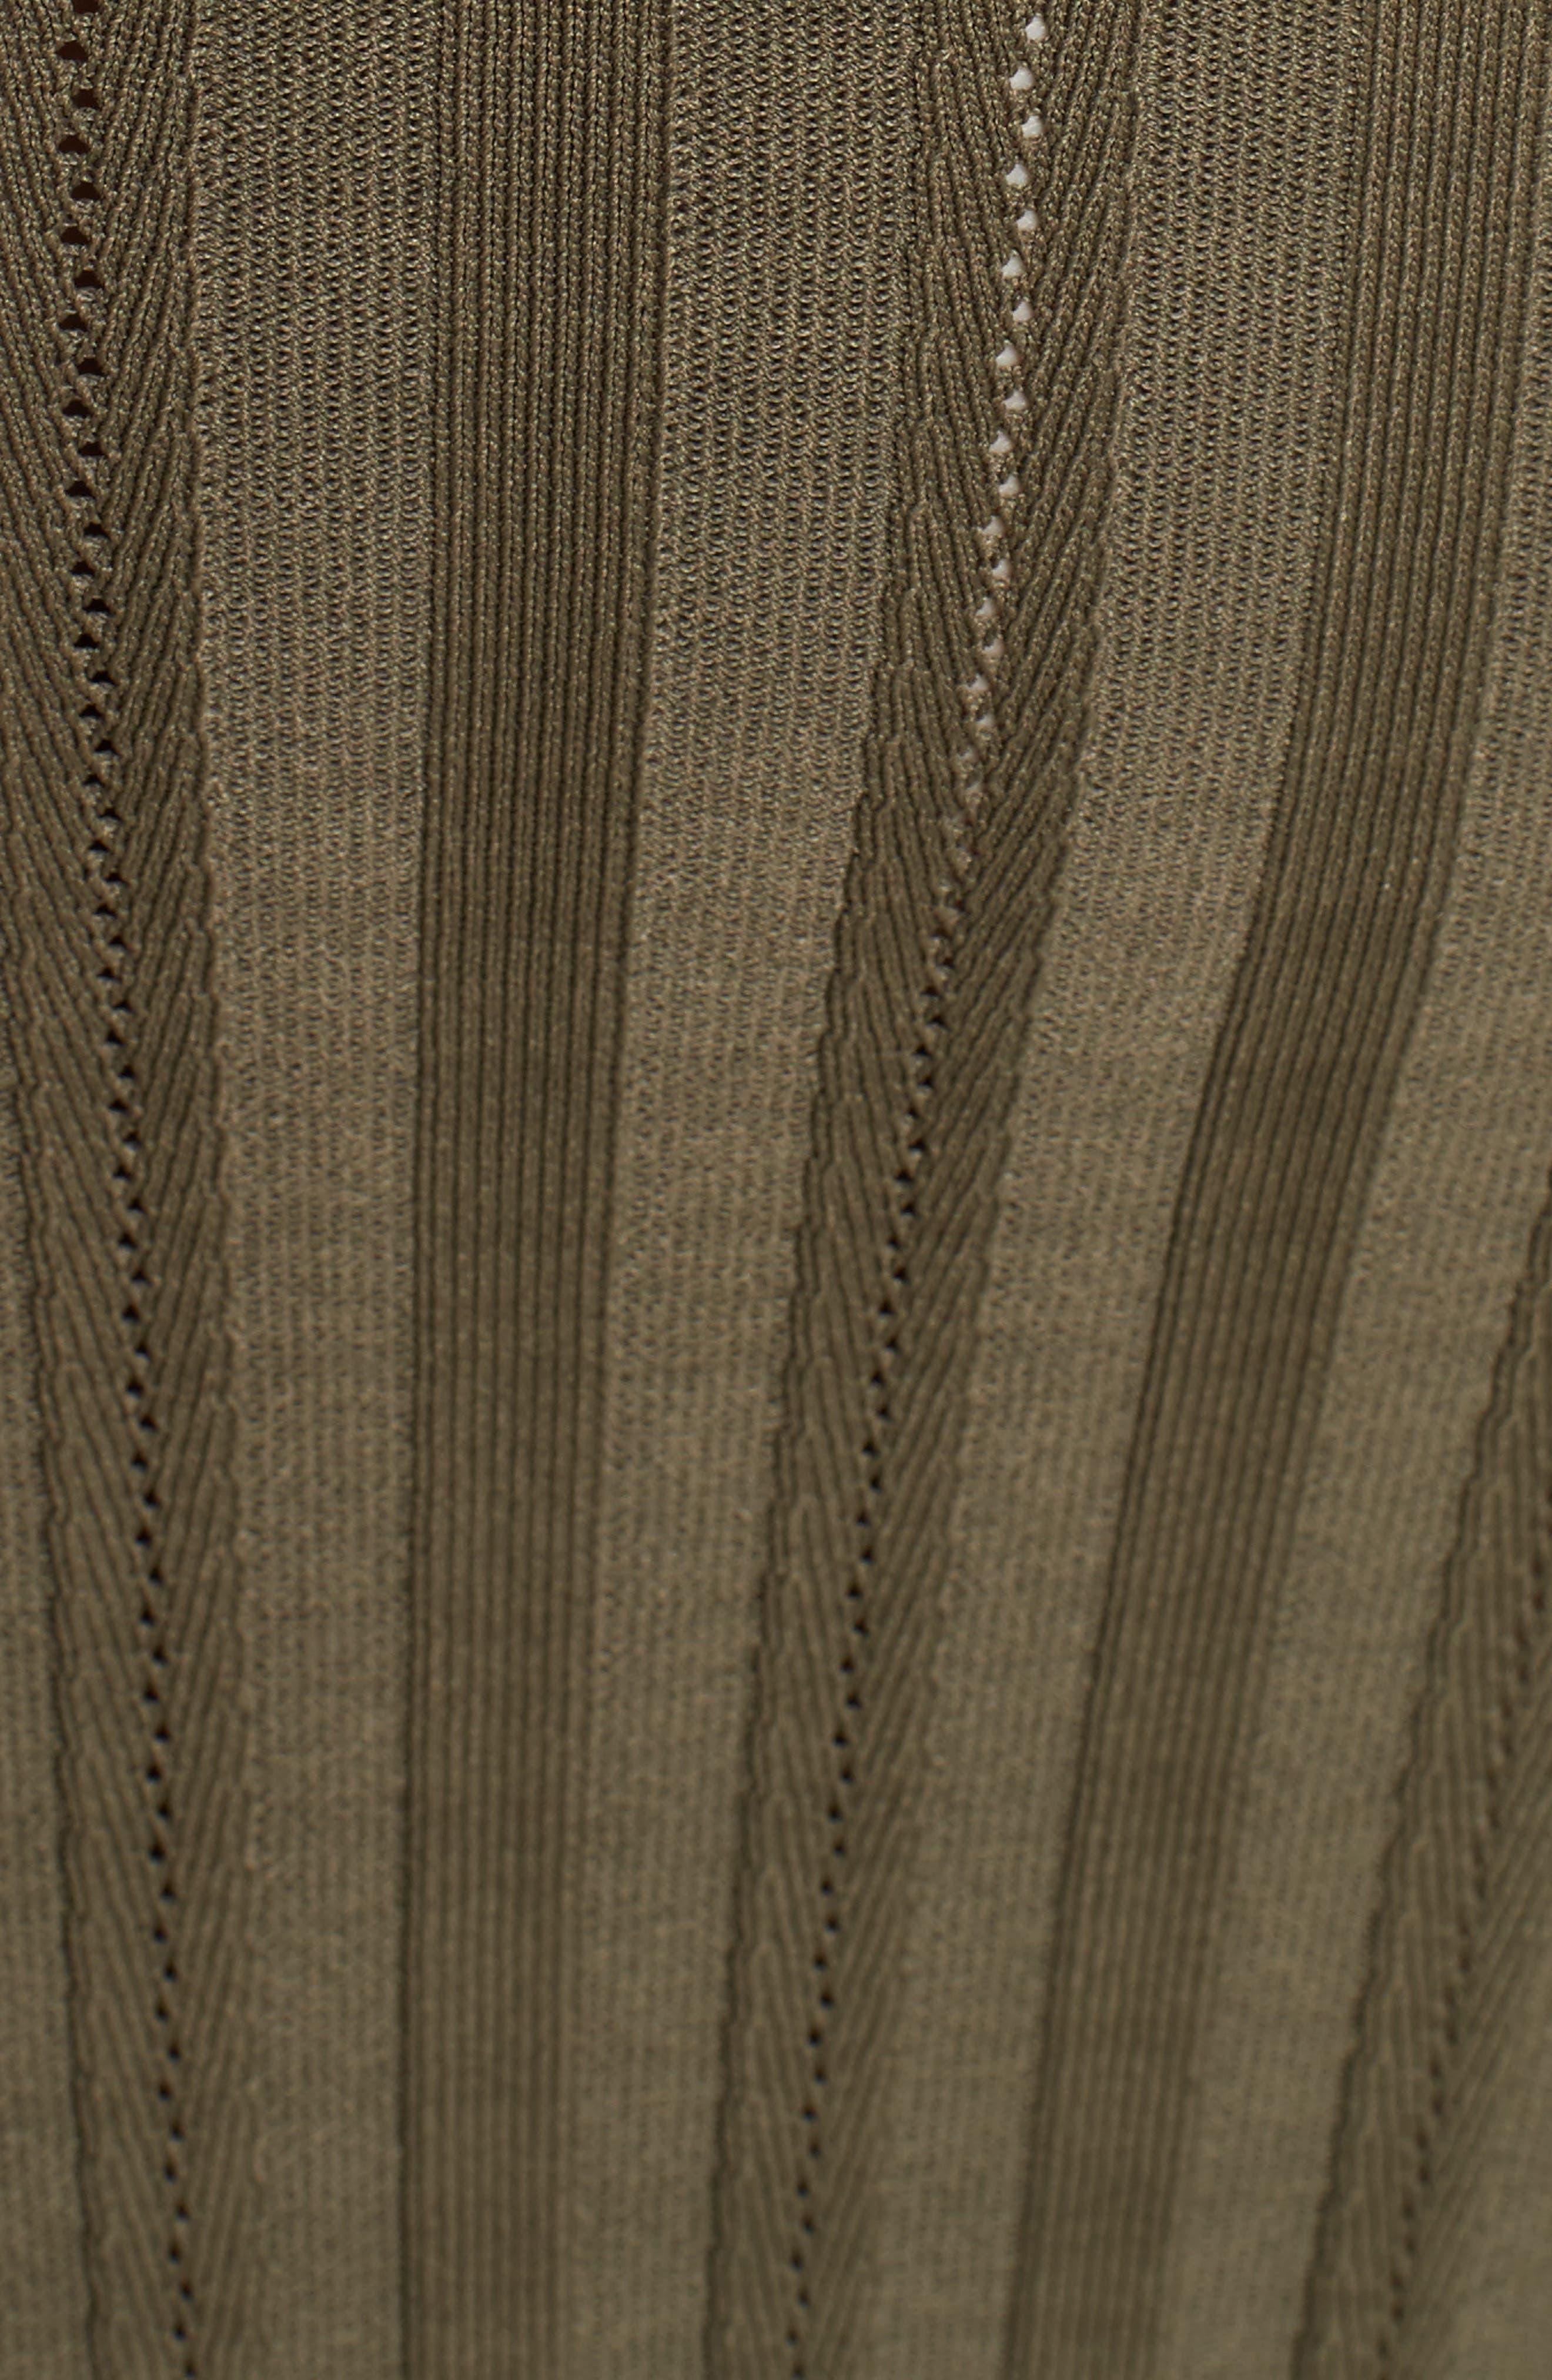 Cutout Knit Dress,                             Alternate thumbnail 5, color,                             341